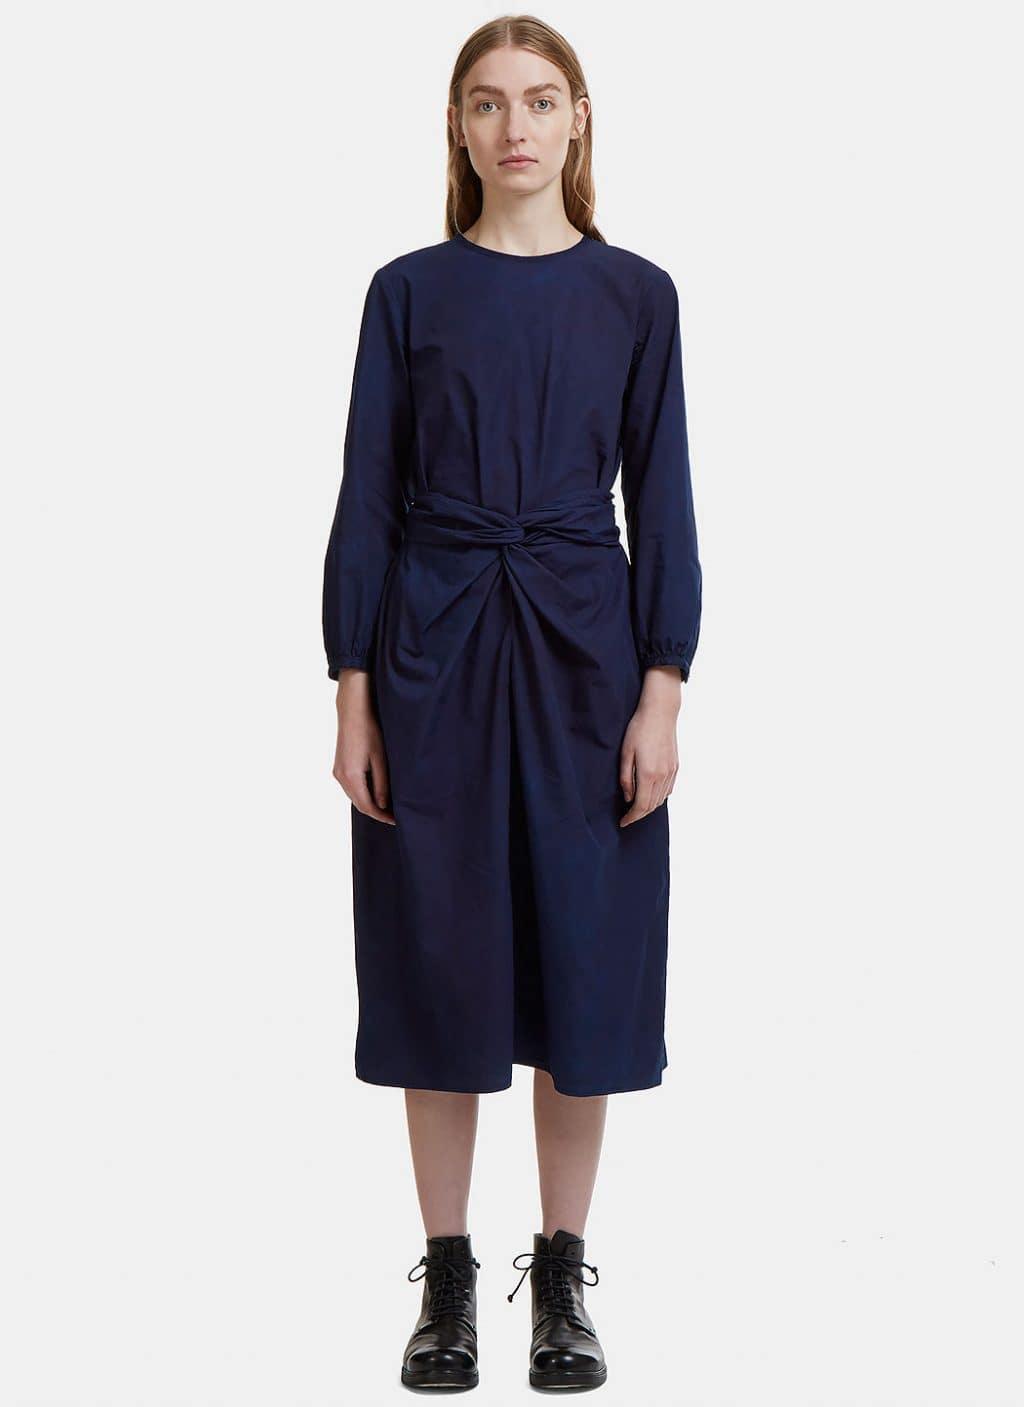 435a4340d4f0 COSMIC WONDER Bow Front Blue Dress - We Select Dresses